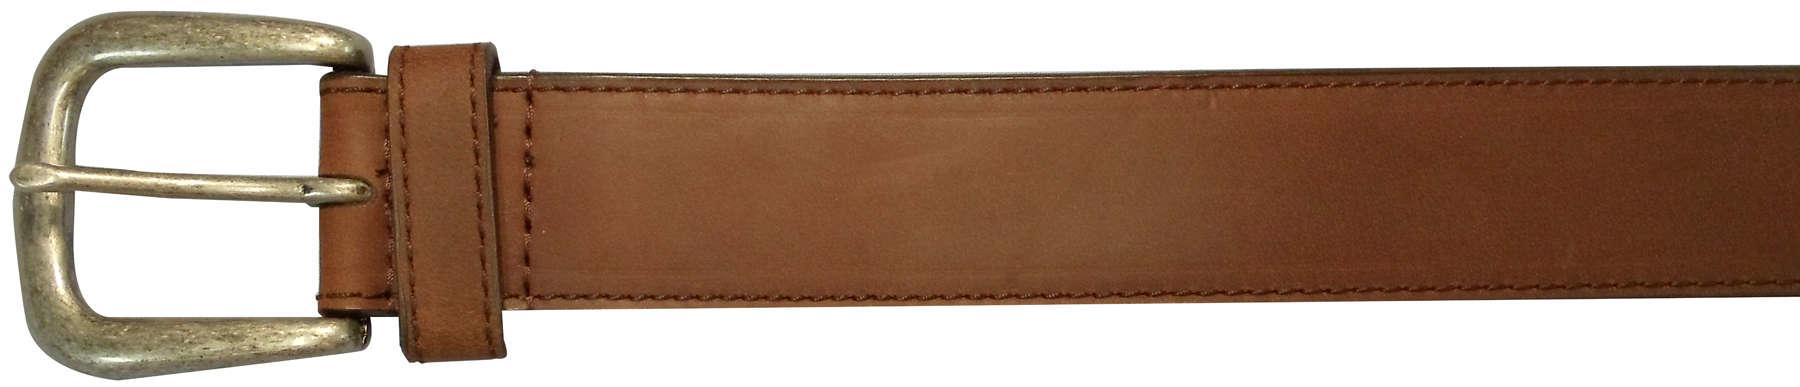 "10625410244 - 44"" Plain Brown Leather Field & Stream Belt"